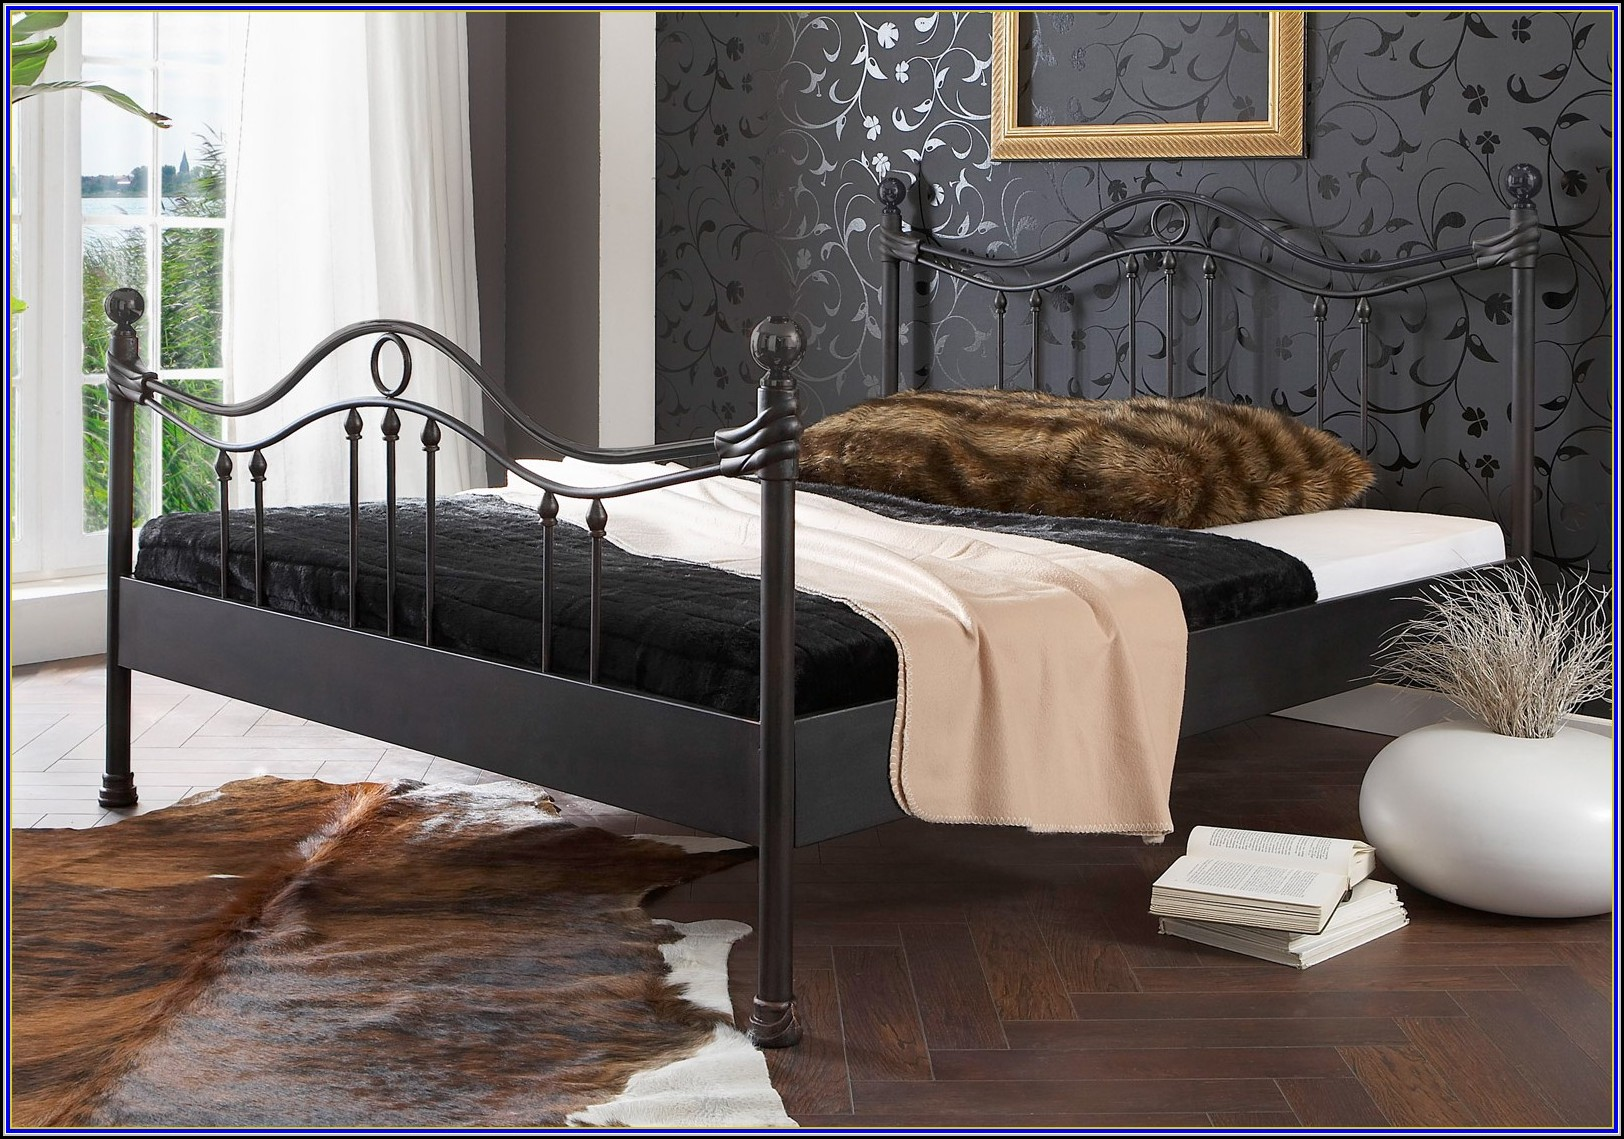 ikea bettgestell 120x200 betten house und dekor galerie 4qra4o313e. Black Bedroom Furniture Sets. Home Design Ideas